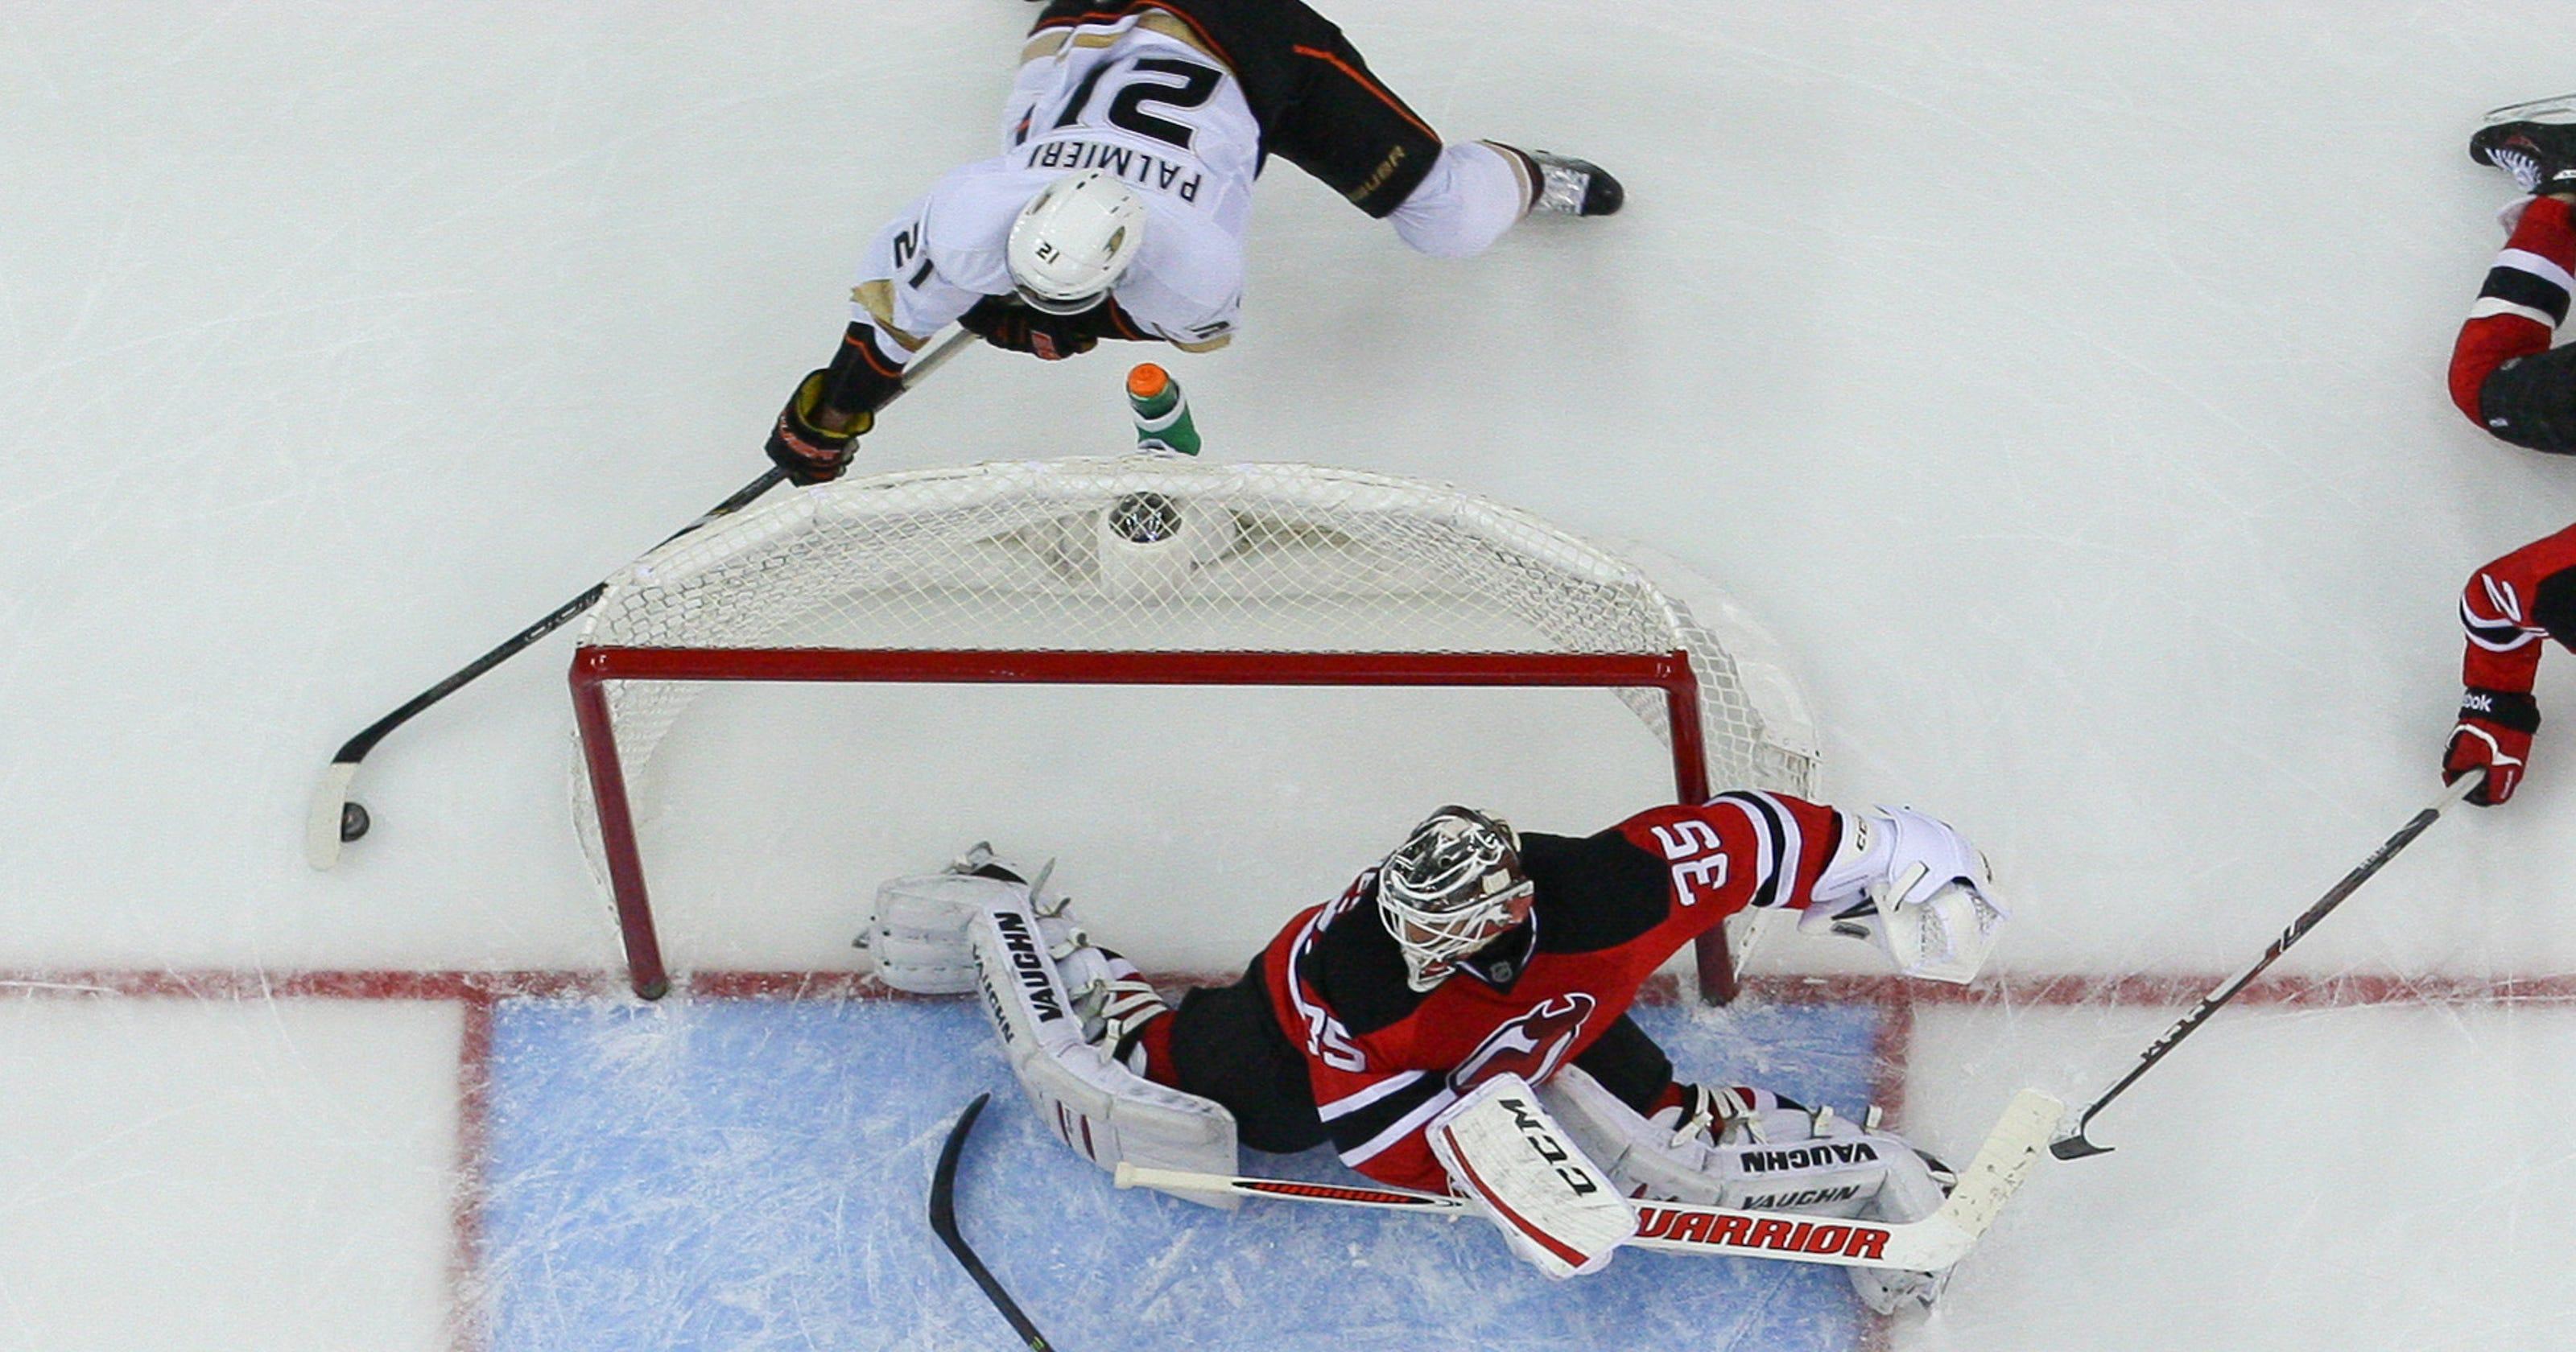 d7d134d15 Ducks win seventh straight, 3-2 over Devils in OT